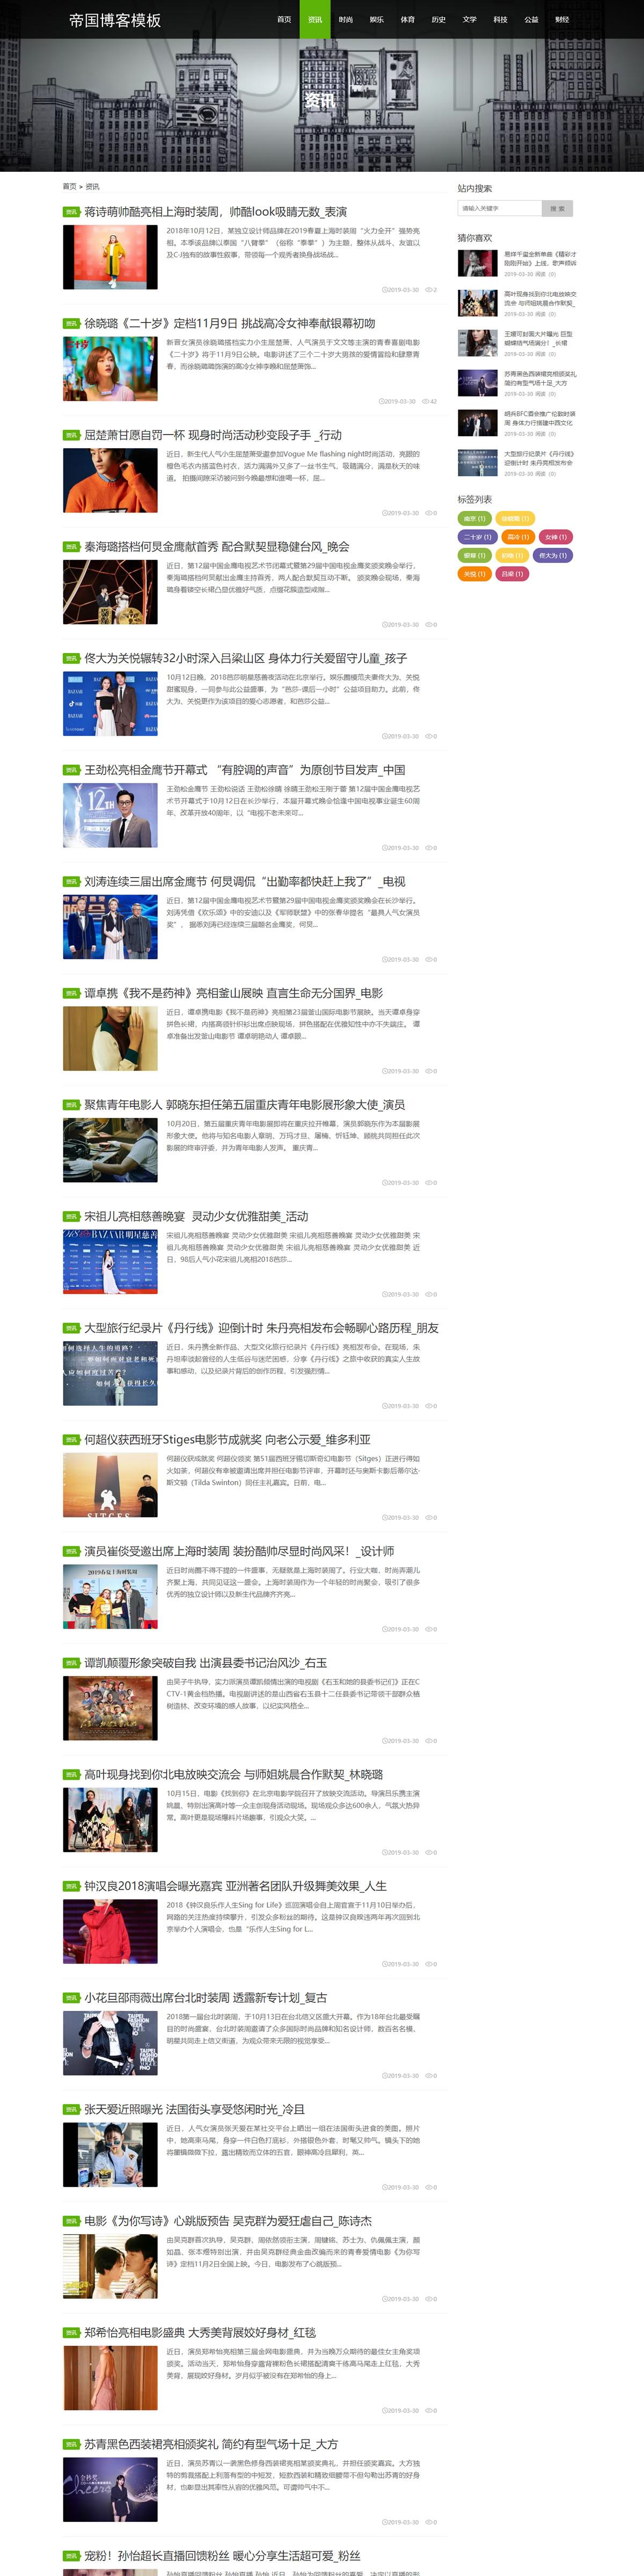 html5响应式帝国cms个人博客网站模板自适应手机_列表